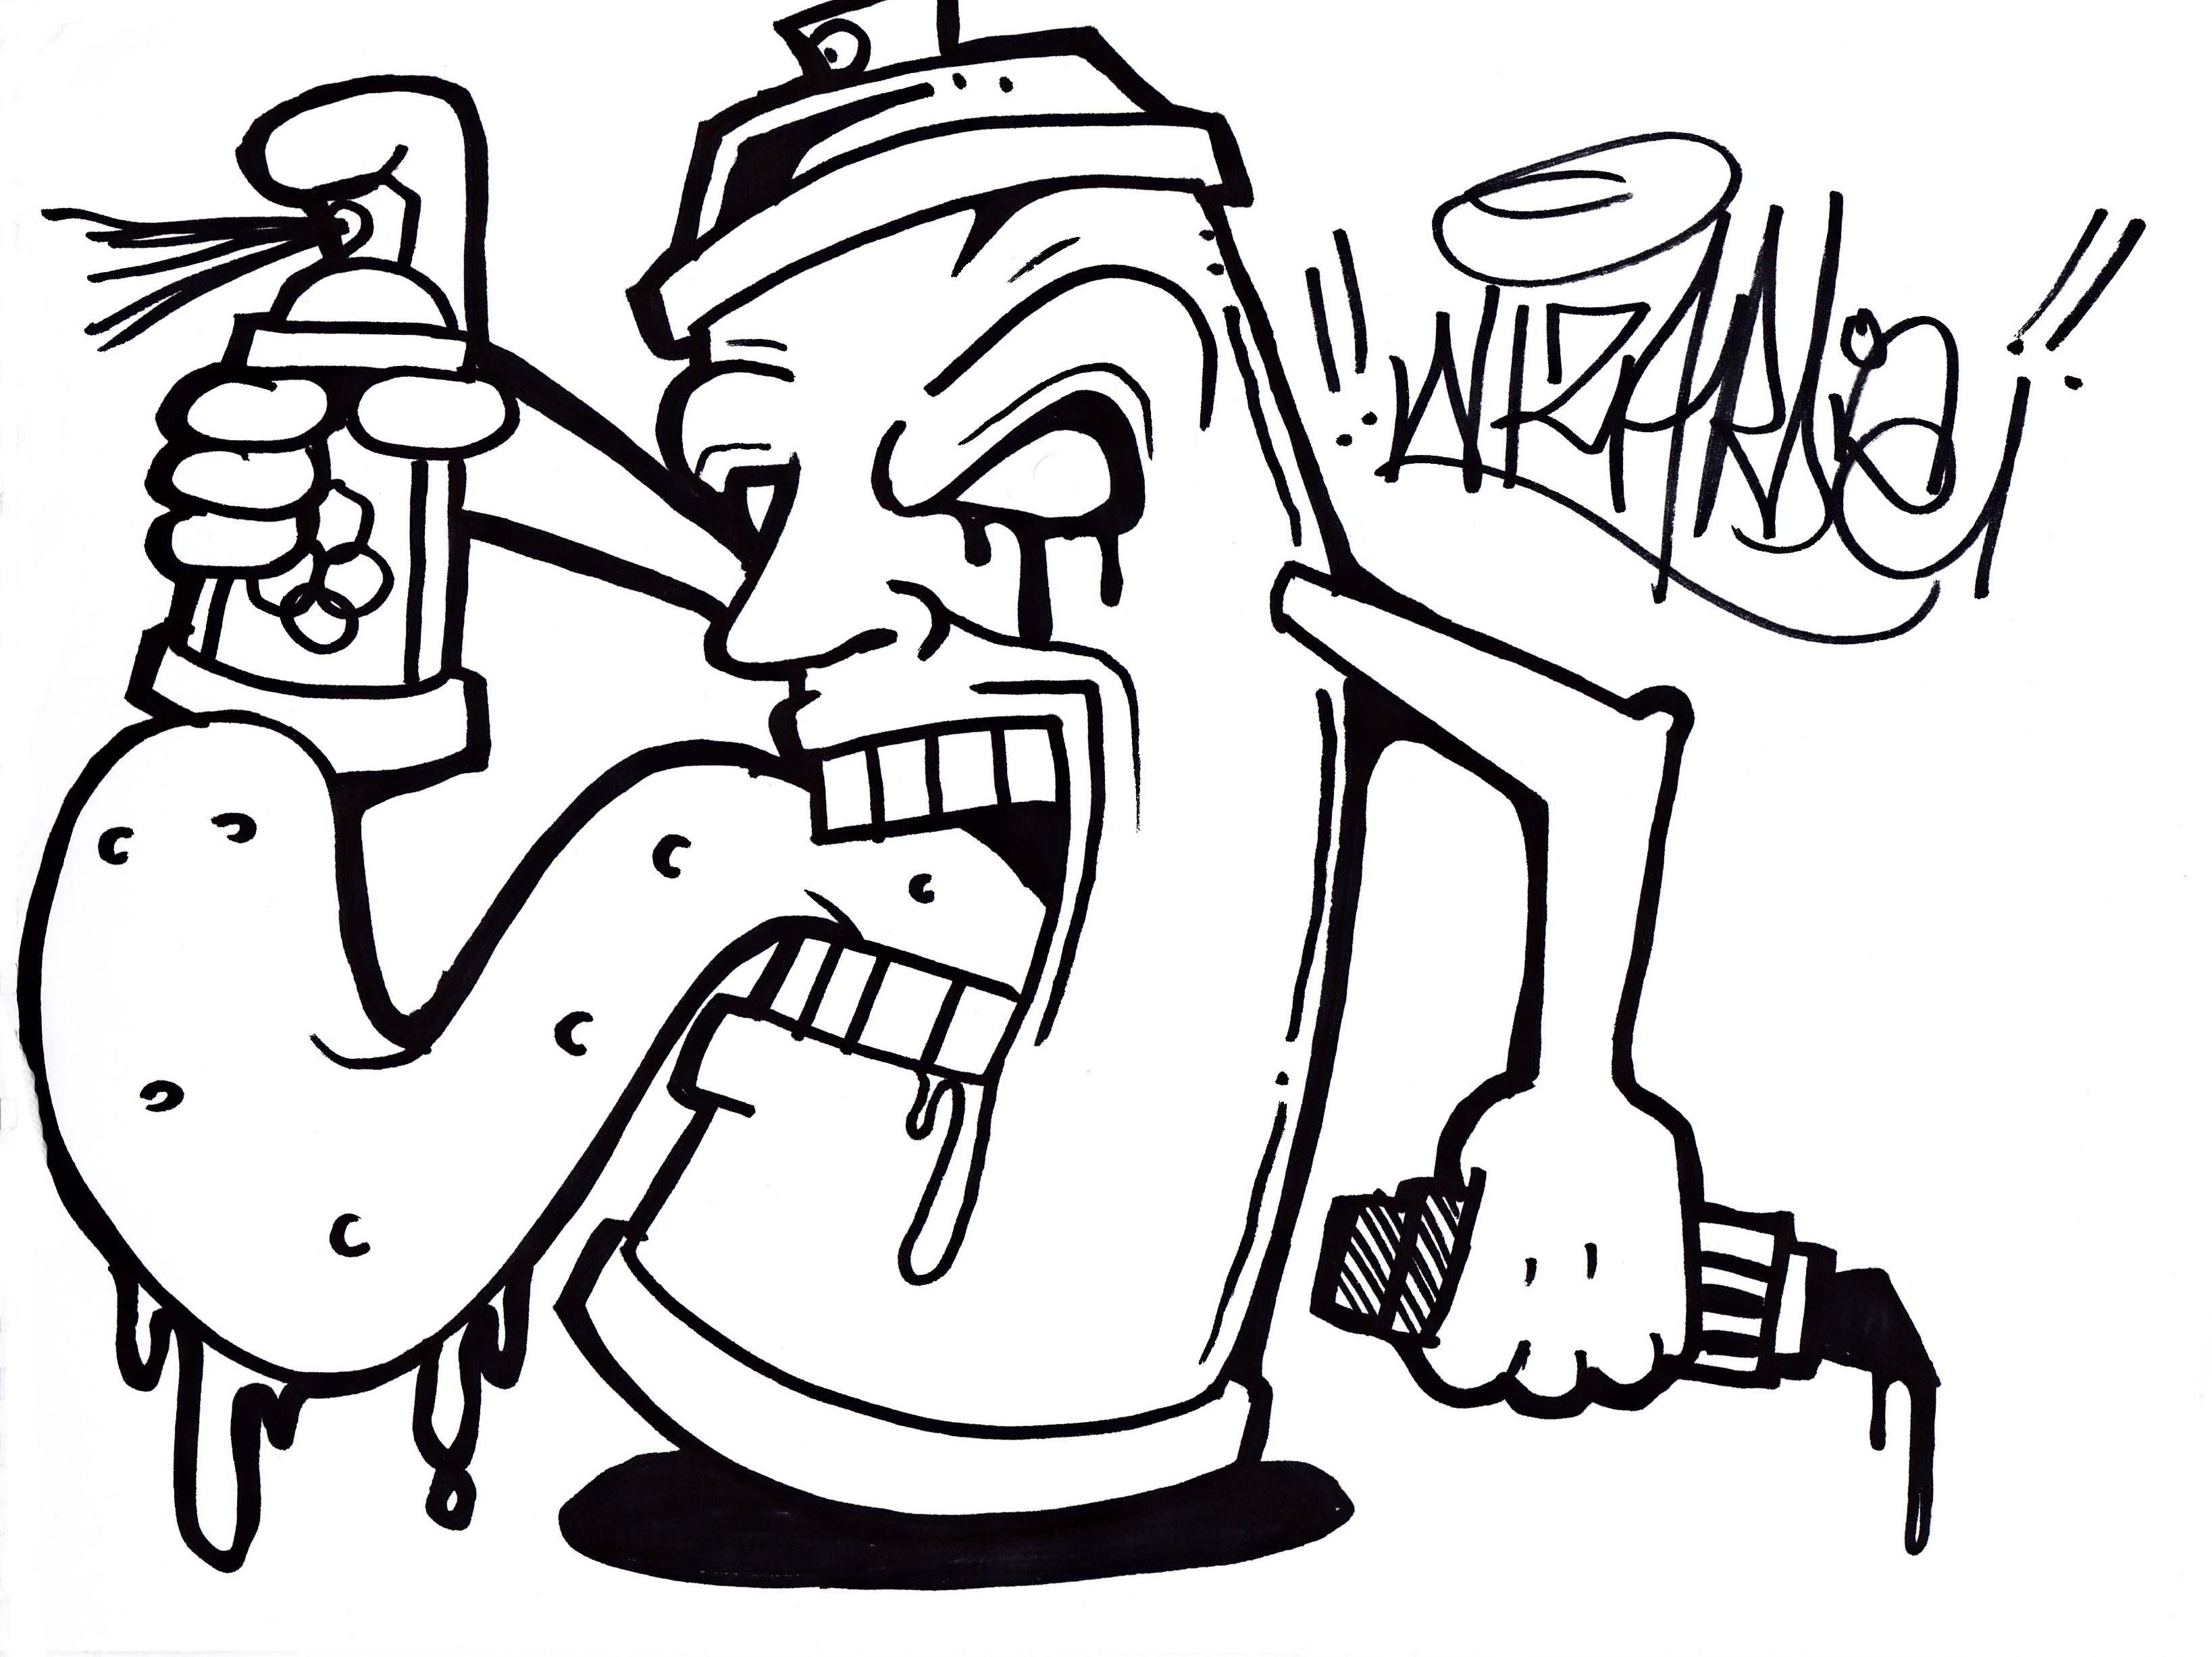 3275x2454 How To Draw A Graffiti Skull Spray Can Graffiti Skull Drawings How